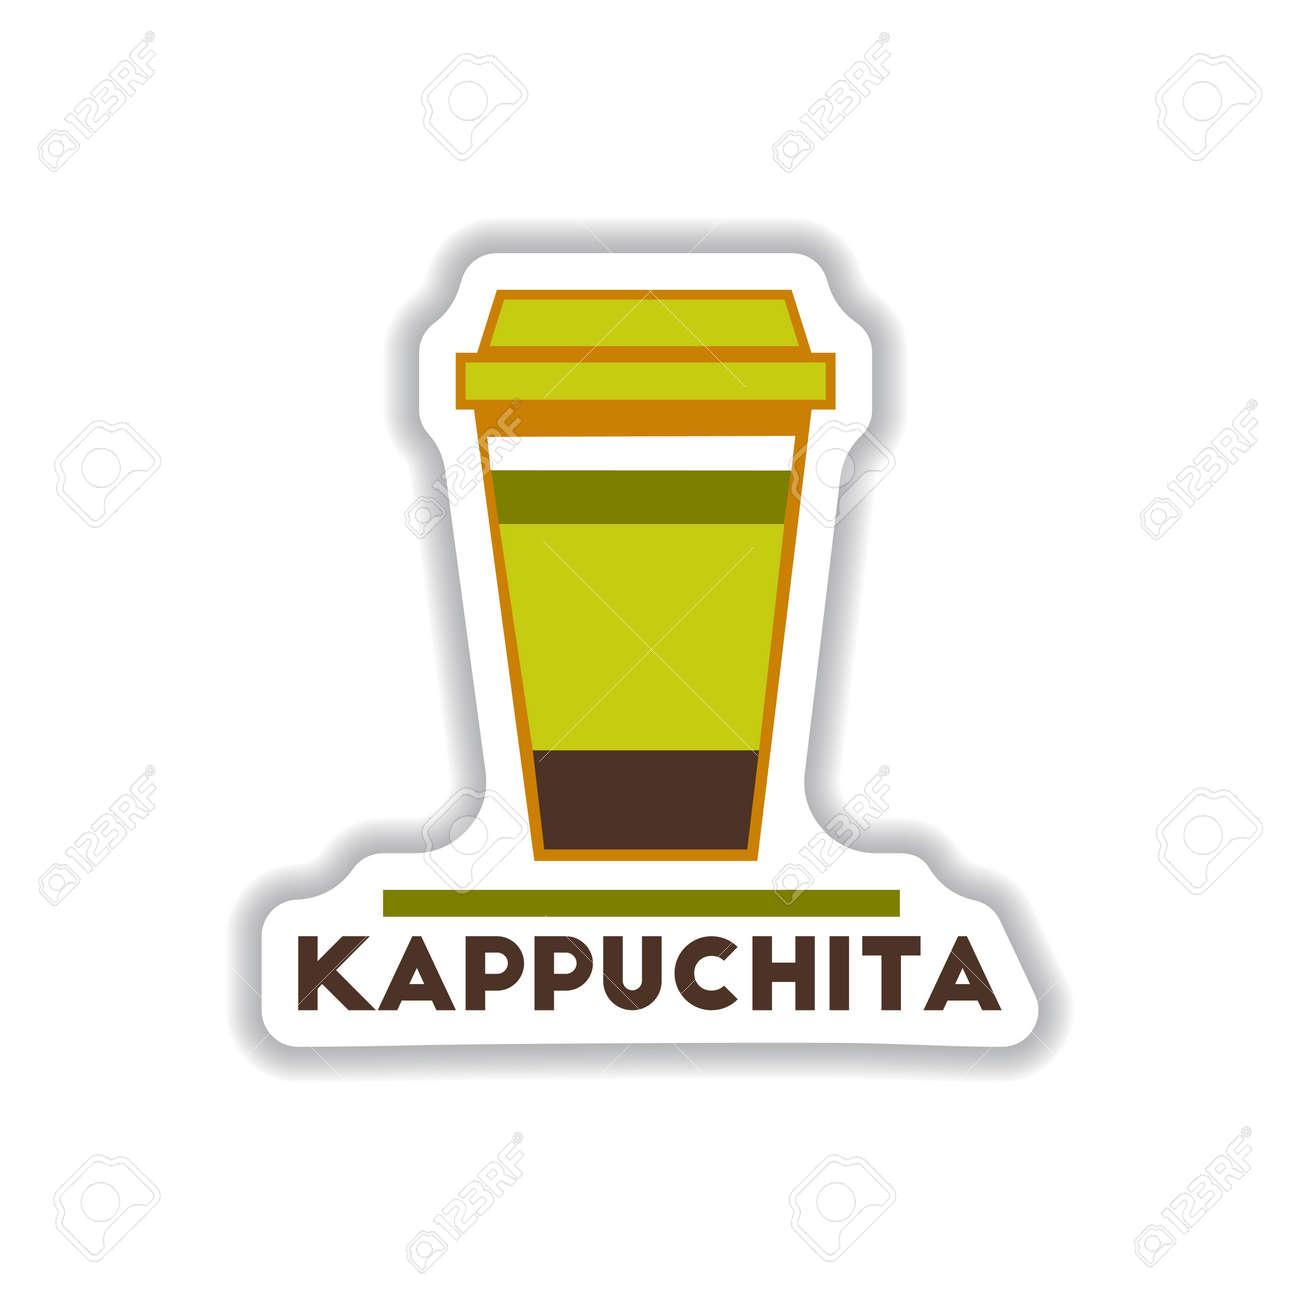 Label Frames And Badges Vector Icons Coffee Emblem Kappuchita ...